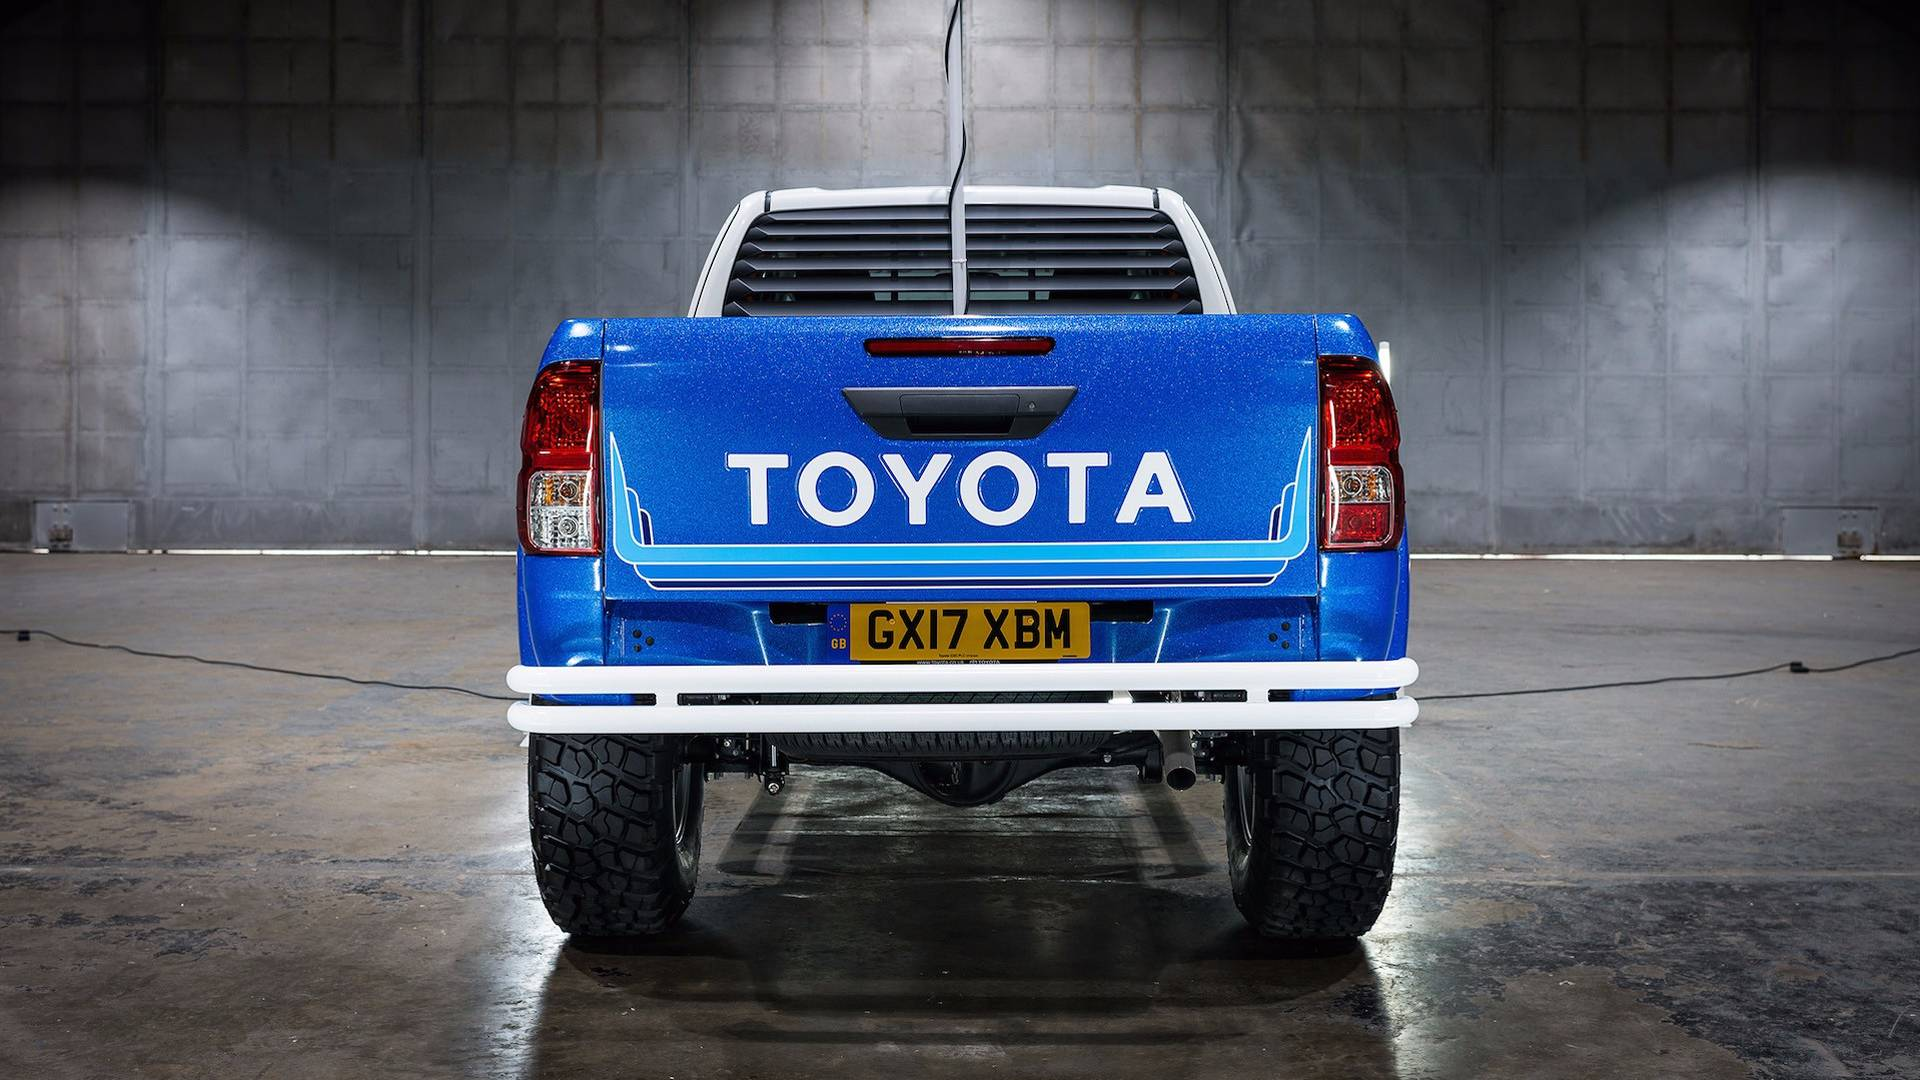 Toyota_Hilux_Bruiser_05